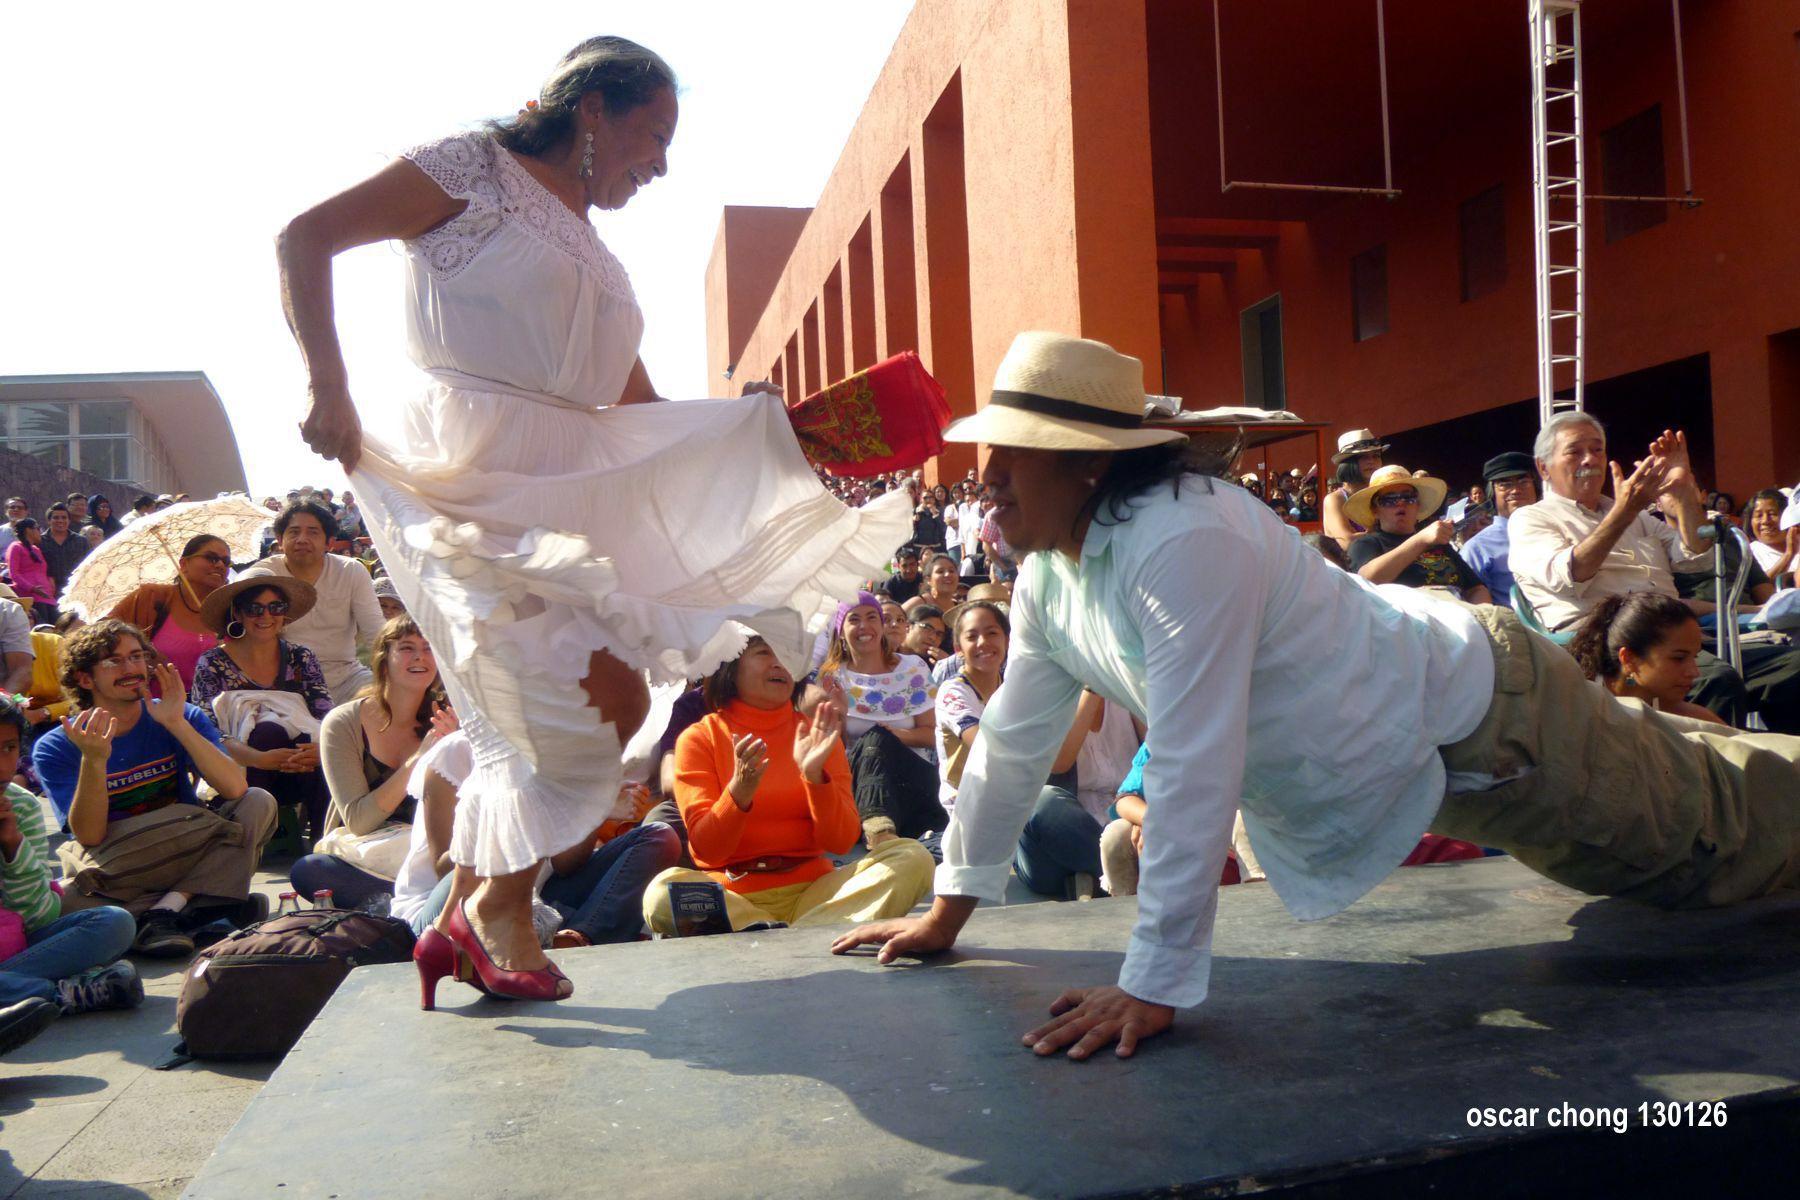 Son Jarocho Dance